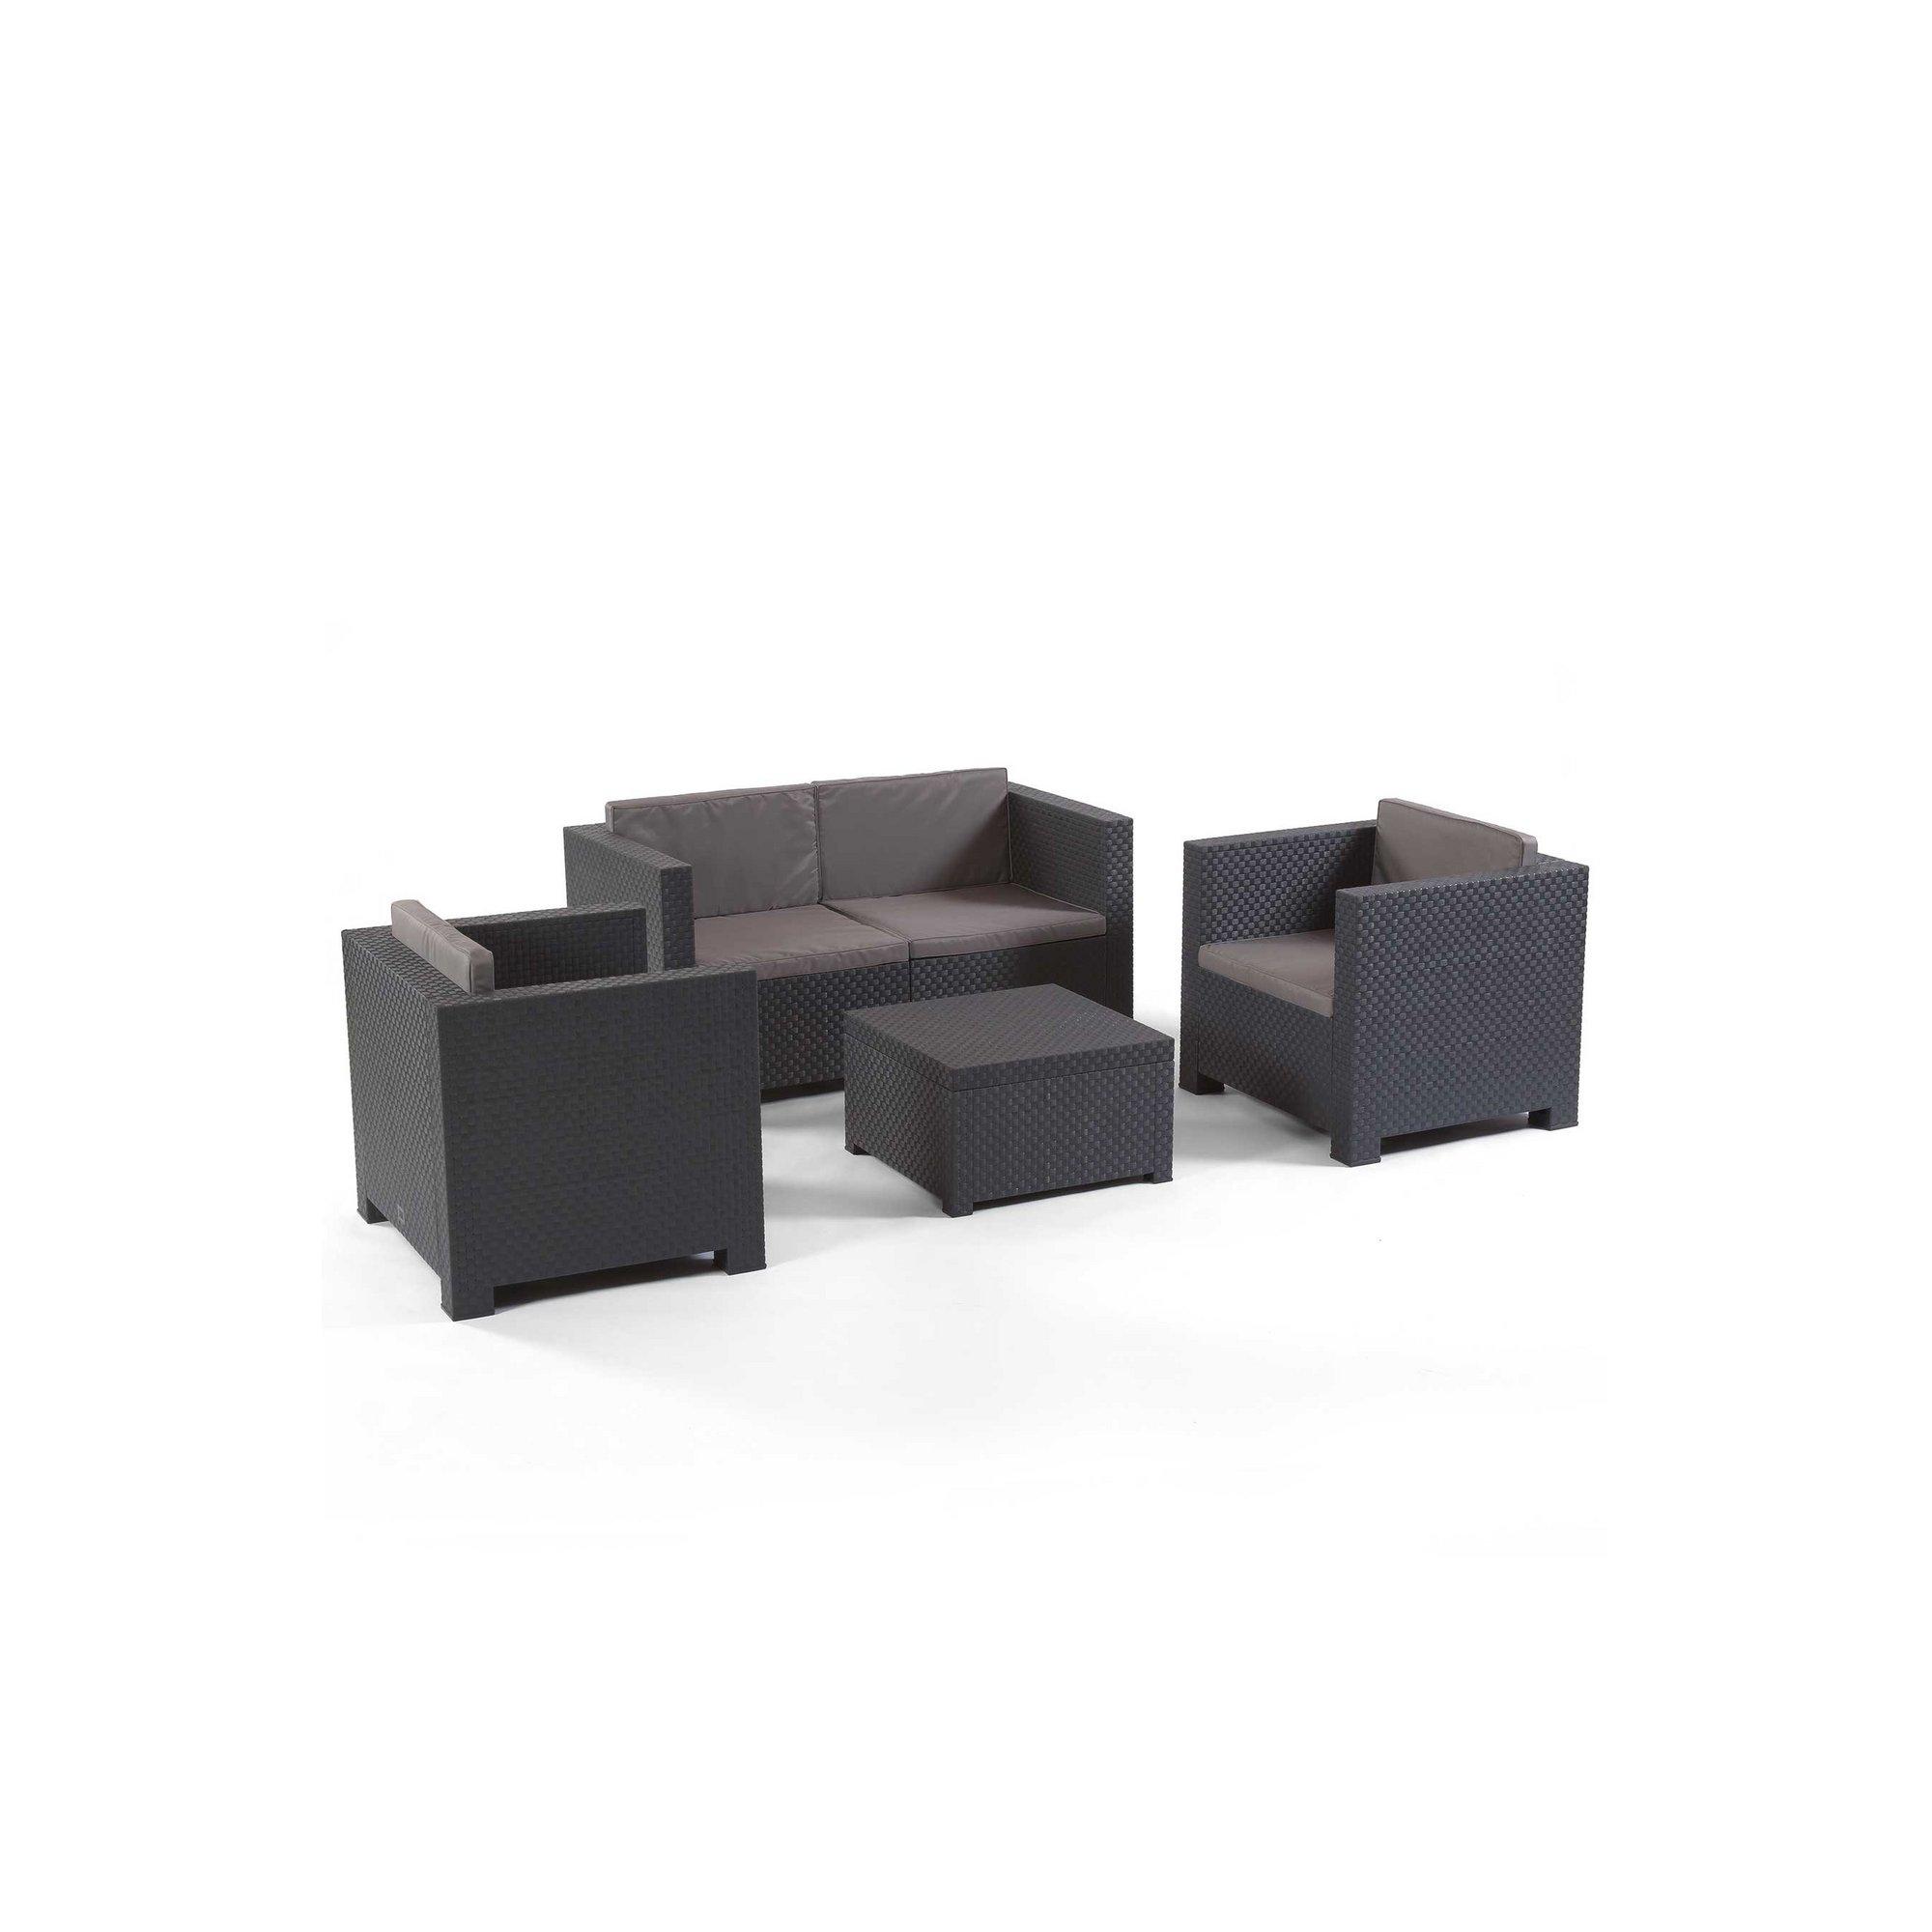 Image of 4-Piece Phoenix Anthracite Sofa Set